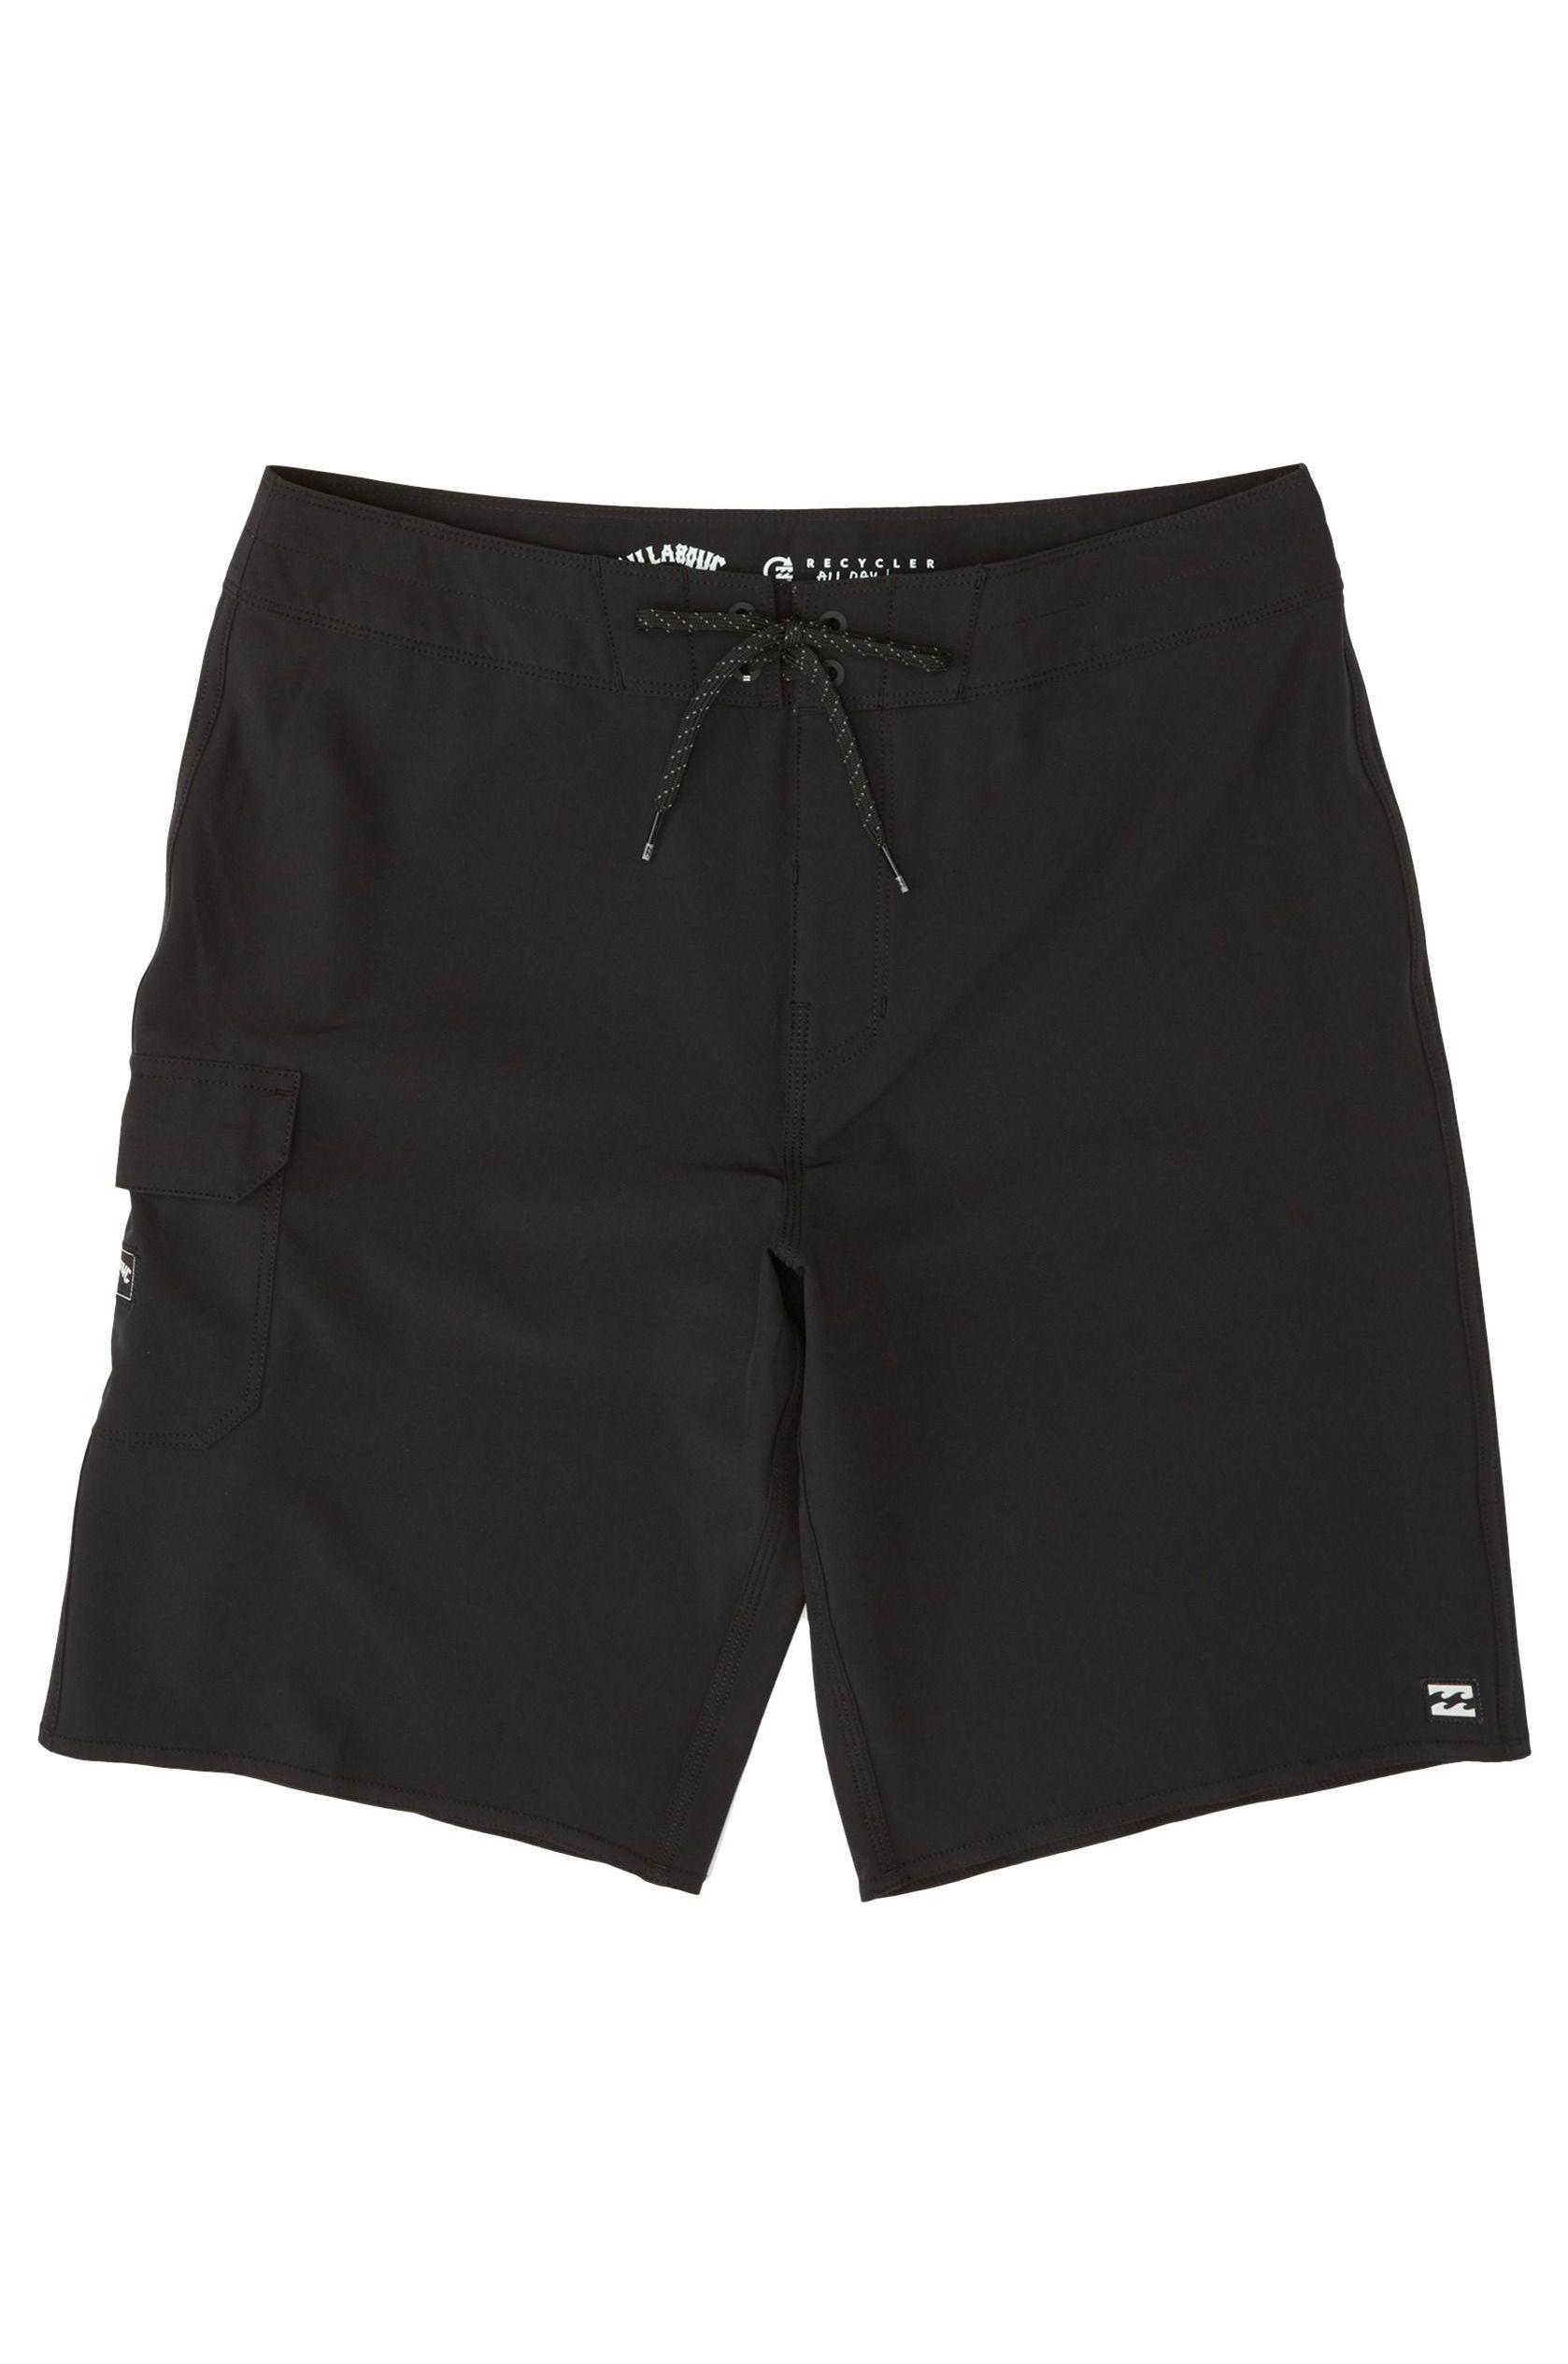 Billabong Boardshorts ALL DAY PRO Black